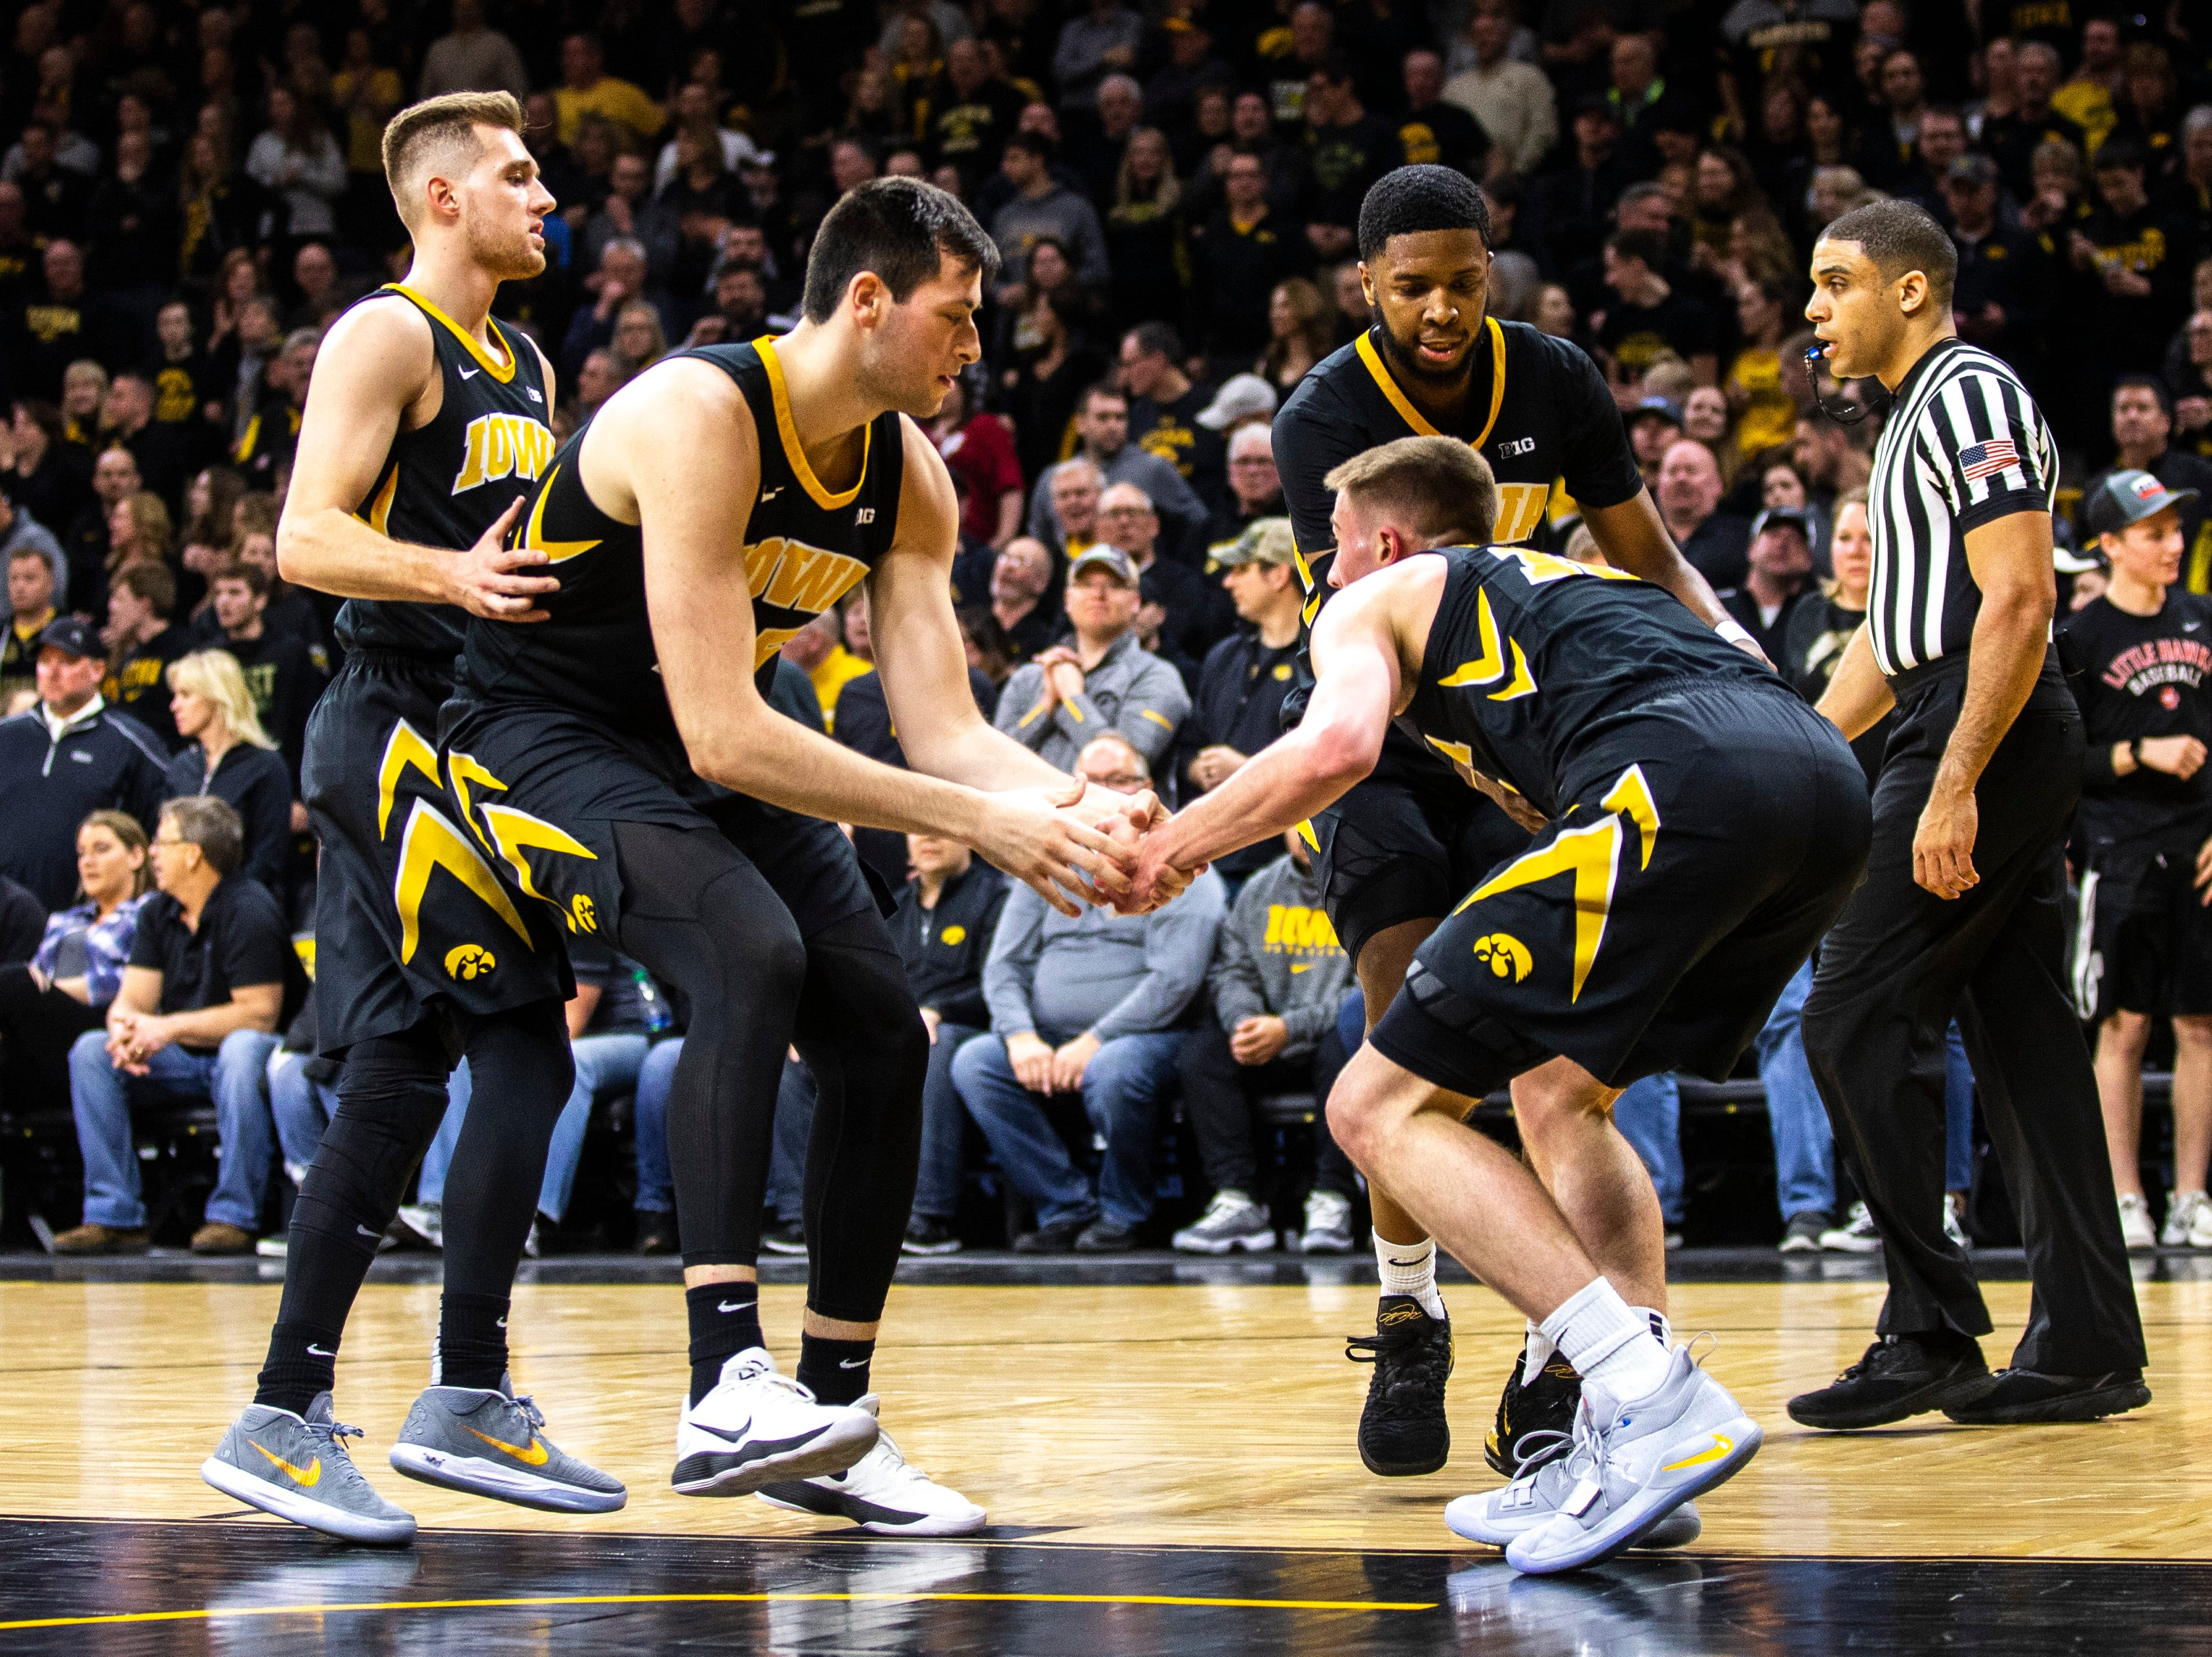 Iowa guard Joe Wieskamp (10) gets helped up by Iowa forward Ryan Kriener (15) and Iowa guard Isaiah Moss (4) during a NCAA Big Ten Conference men's basketball game on Friday, Feb. 22, 2019 at Carver-Hawkeye Arena in Iowa City, Iowa.